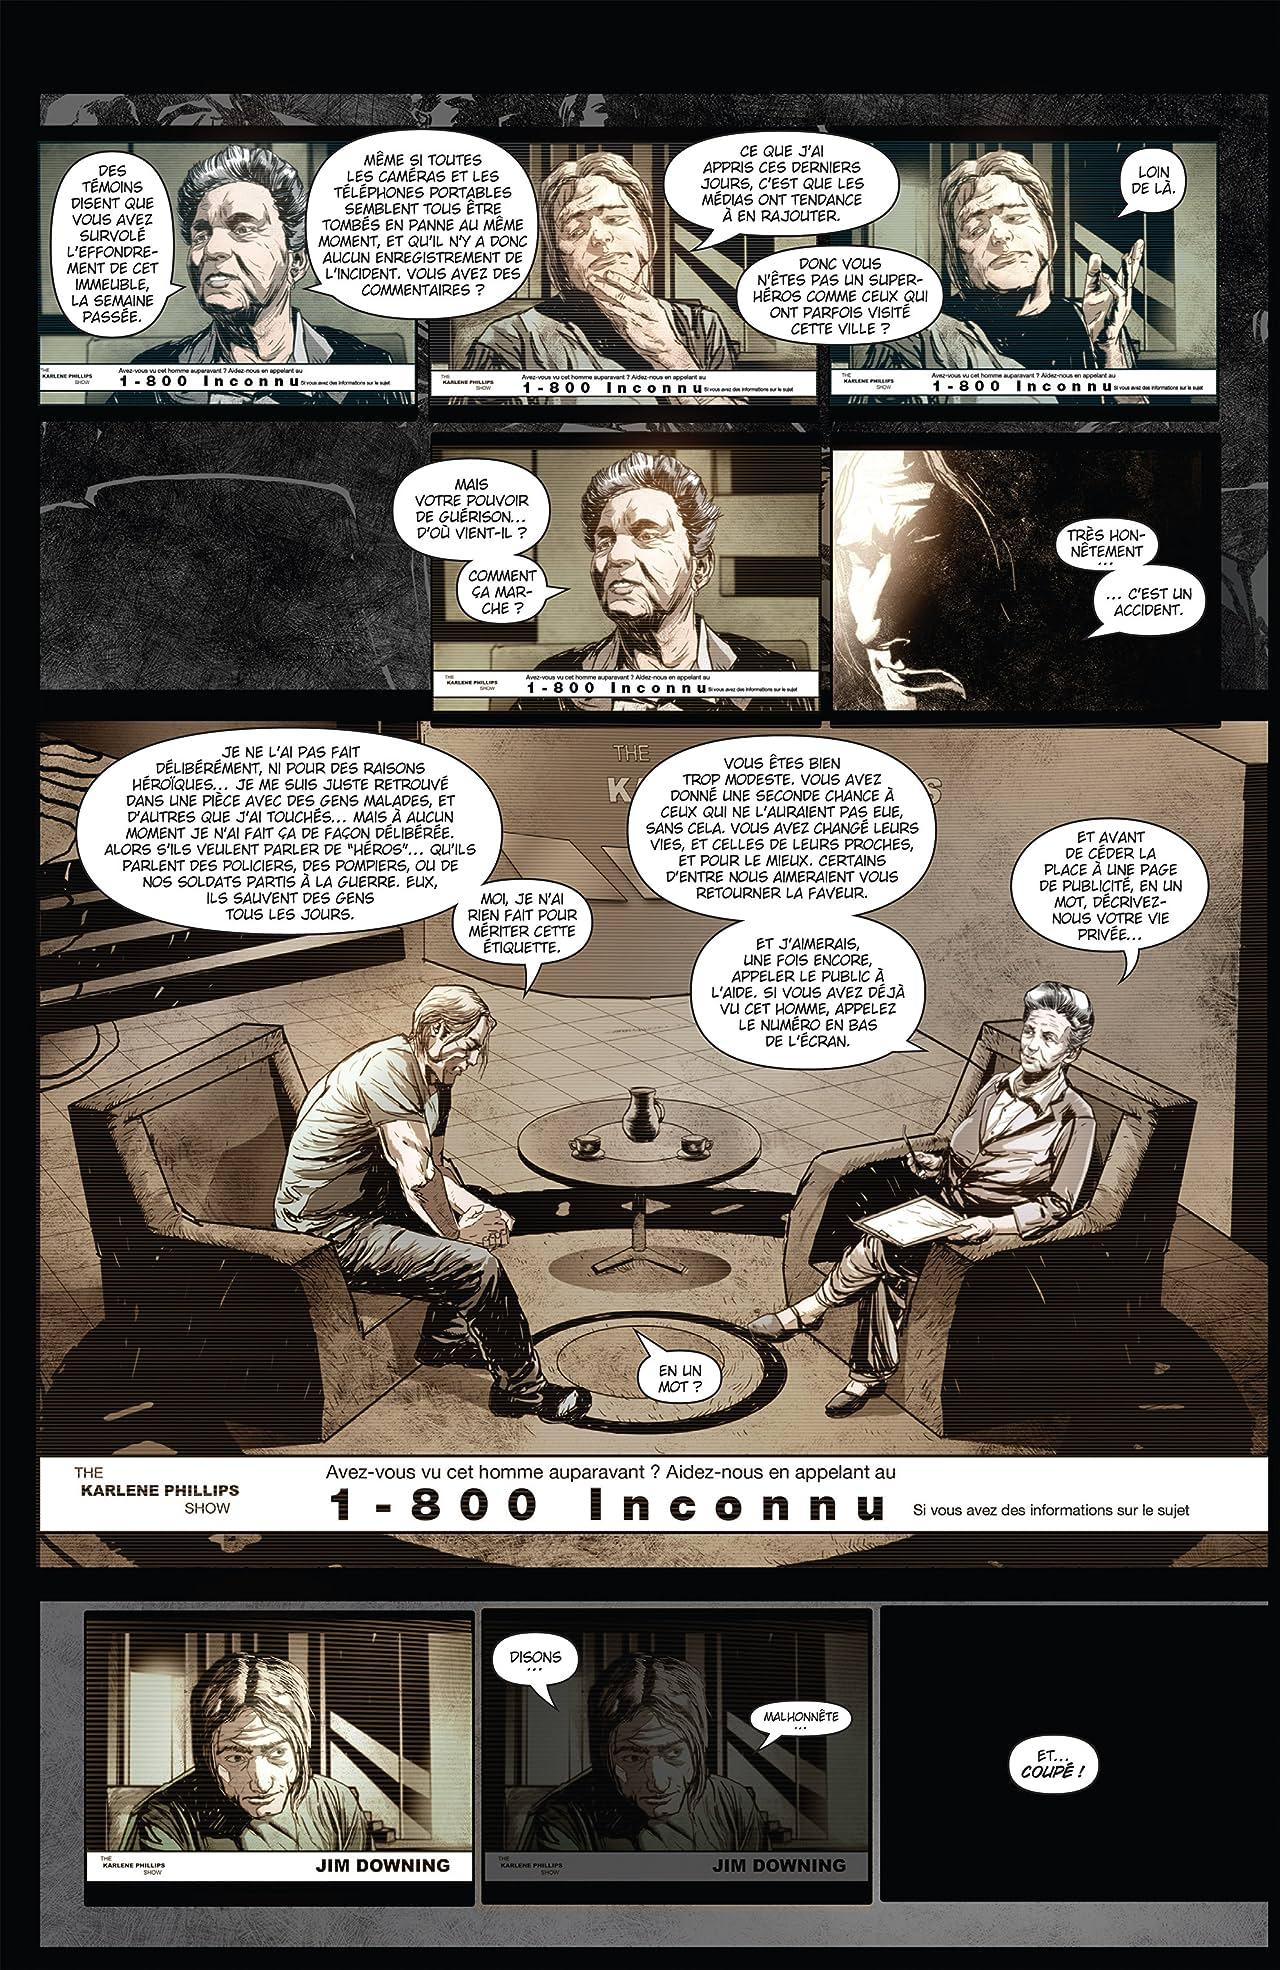 Spawn - La saga infernale Vol. 1: Liens de sang